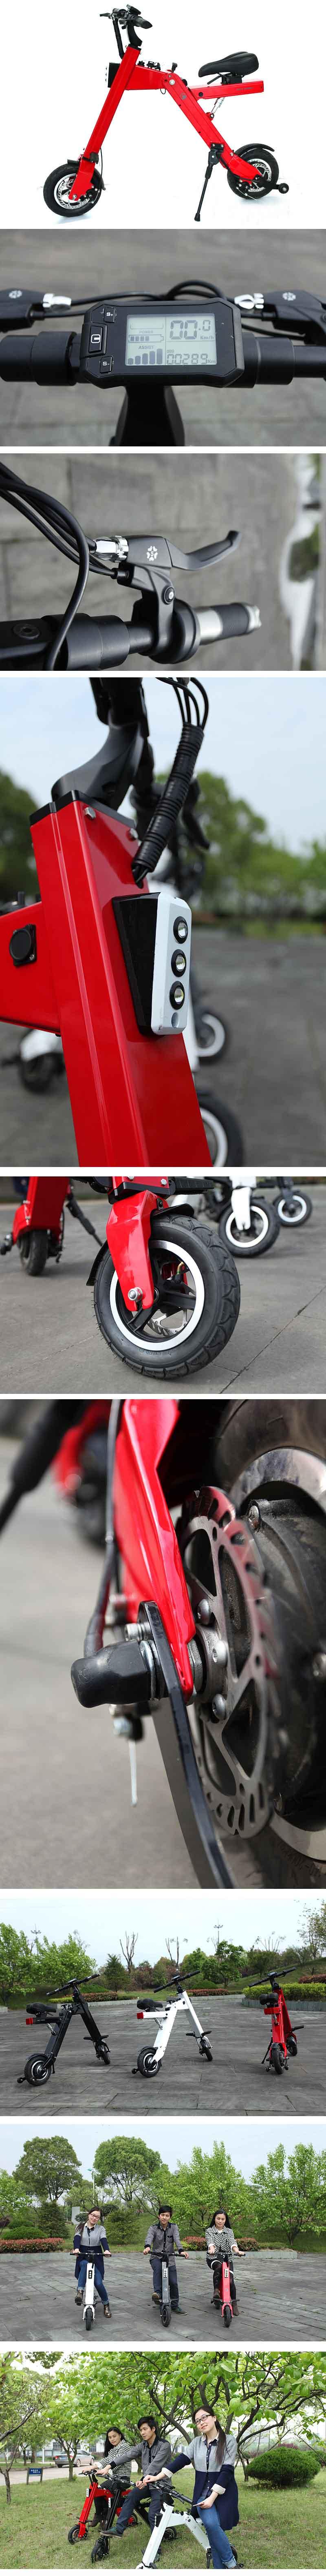 Two Wheel Ebike Mini Foldable Scooter 250W